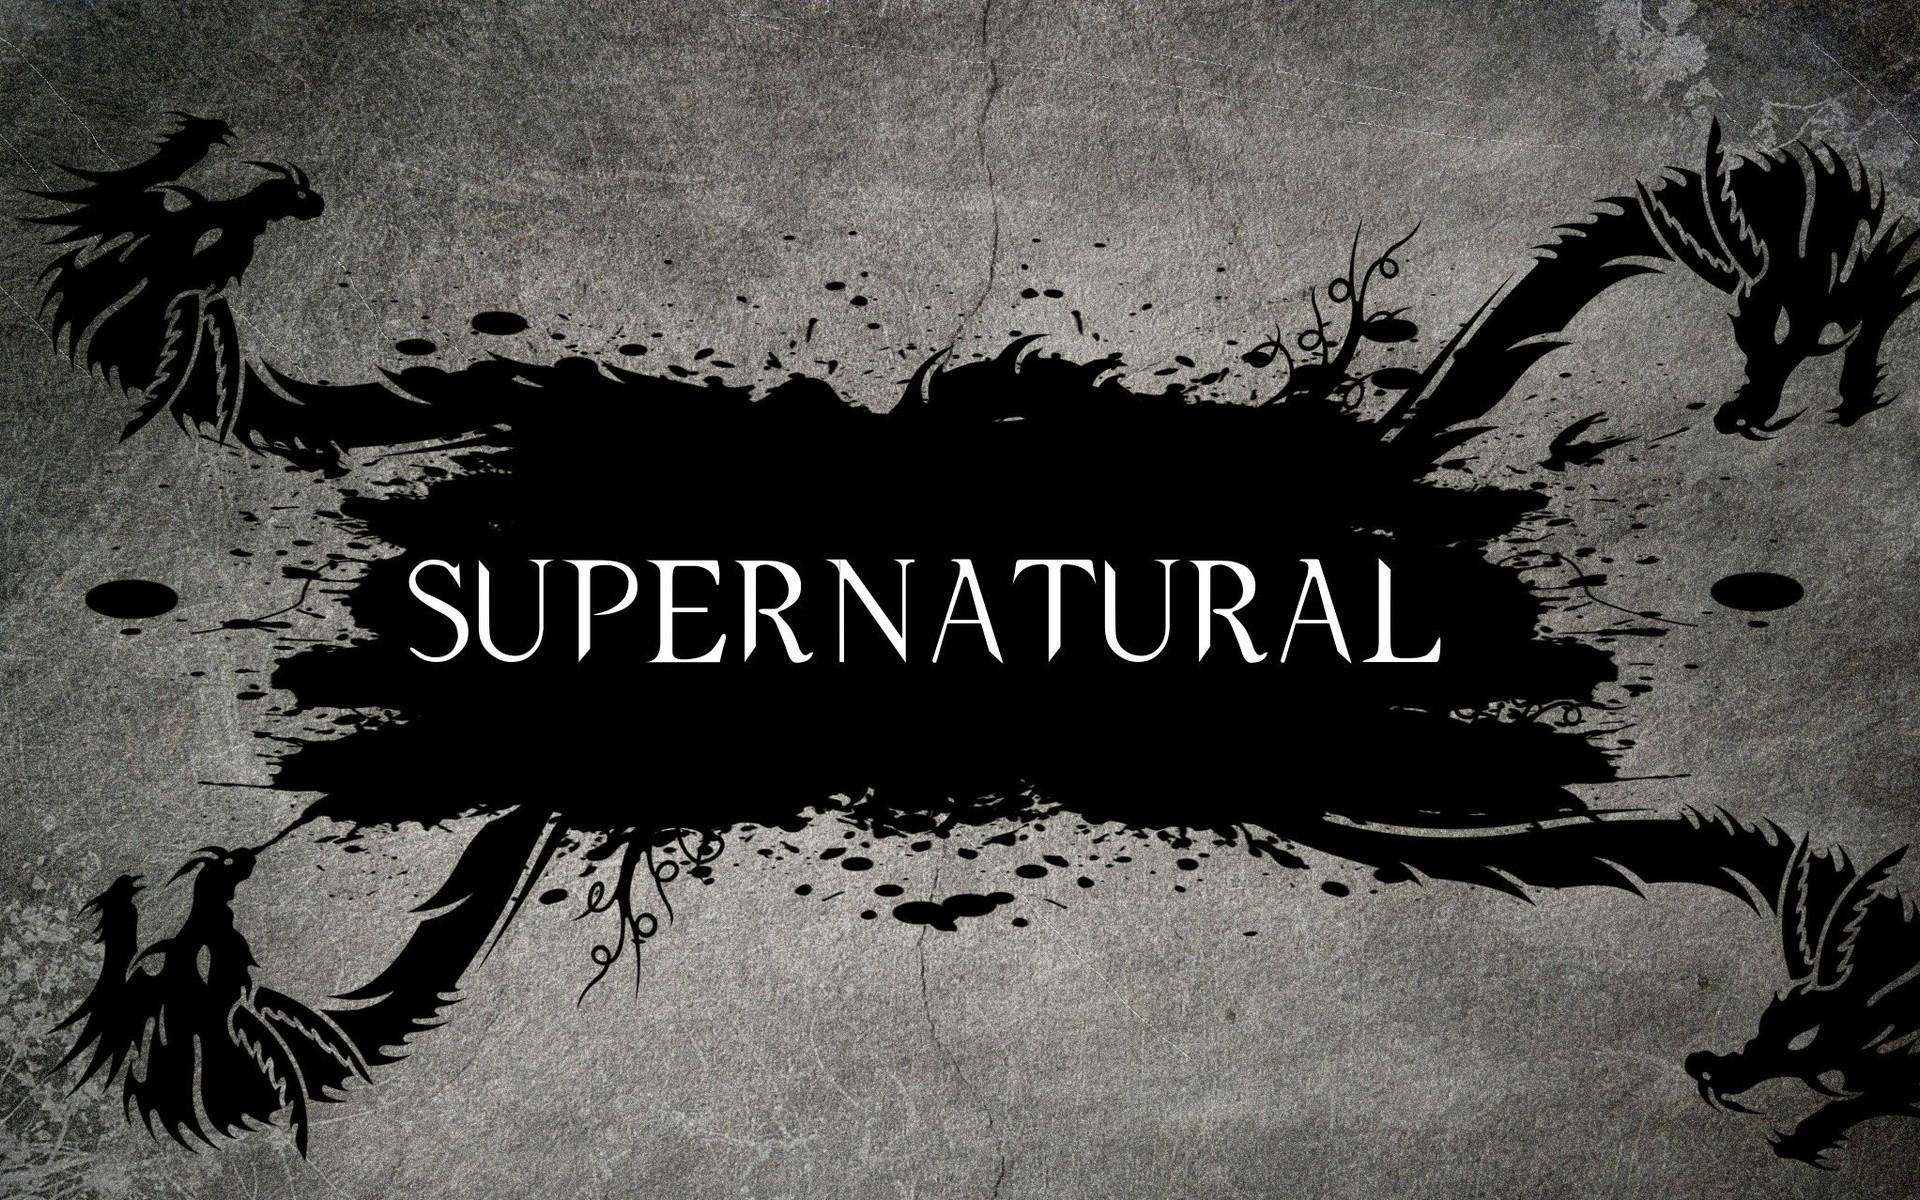 supernatural, the inscription, dragon, supernatural, the .